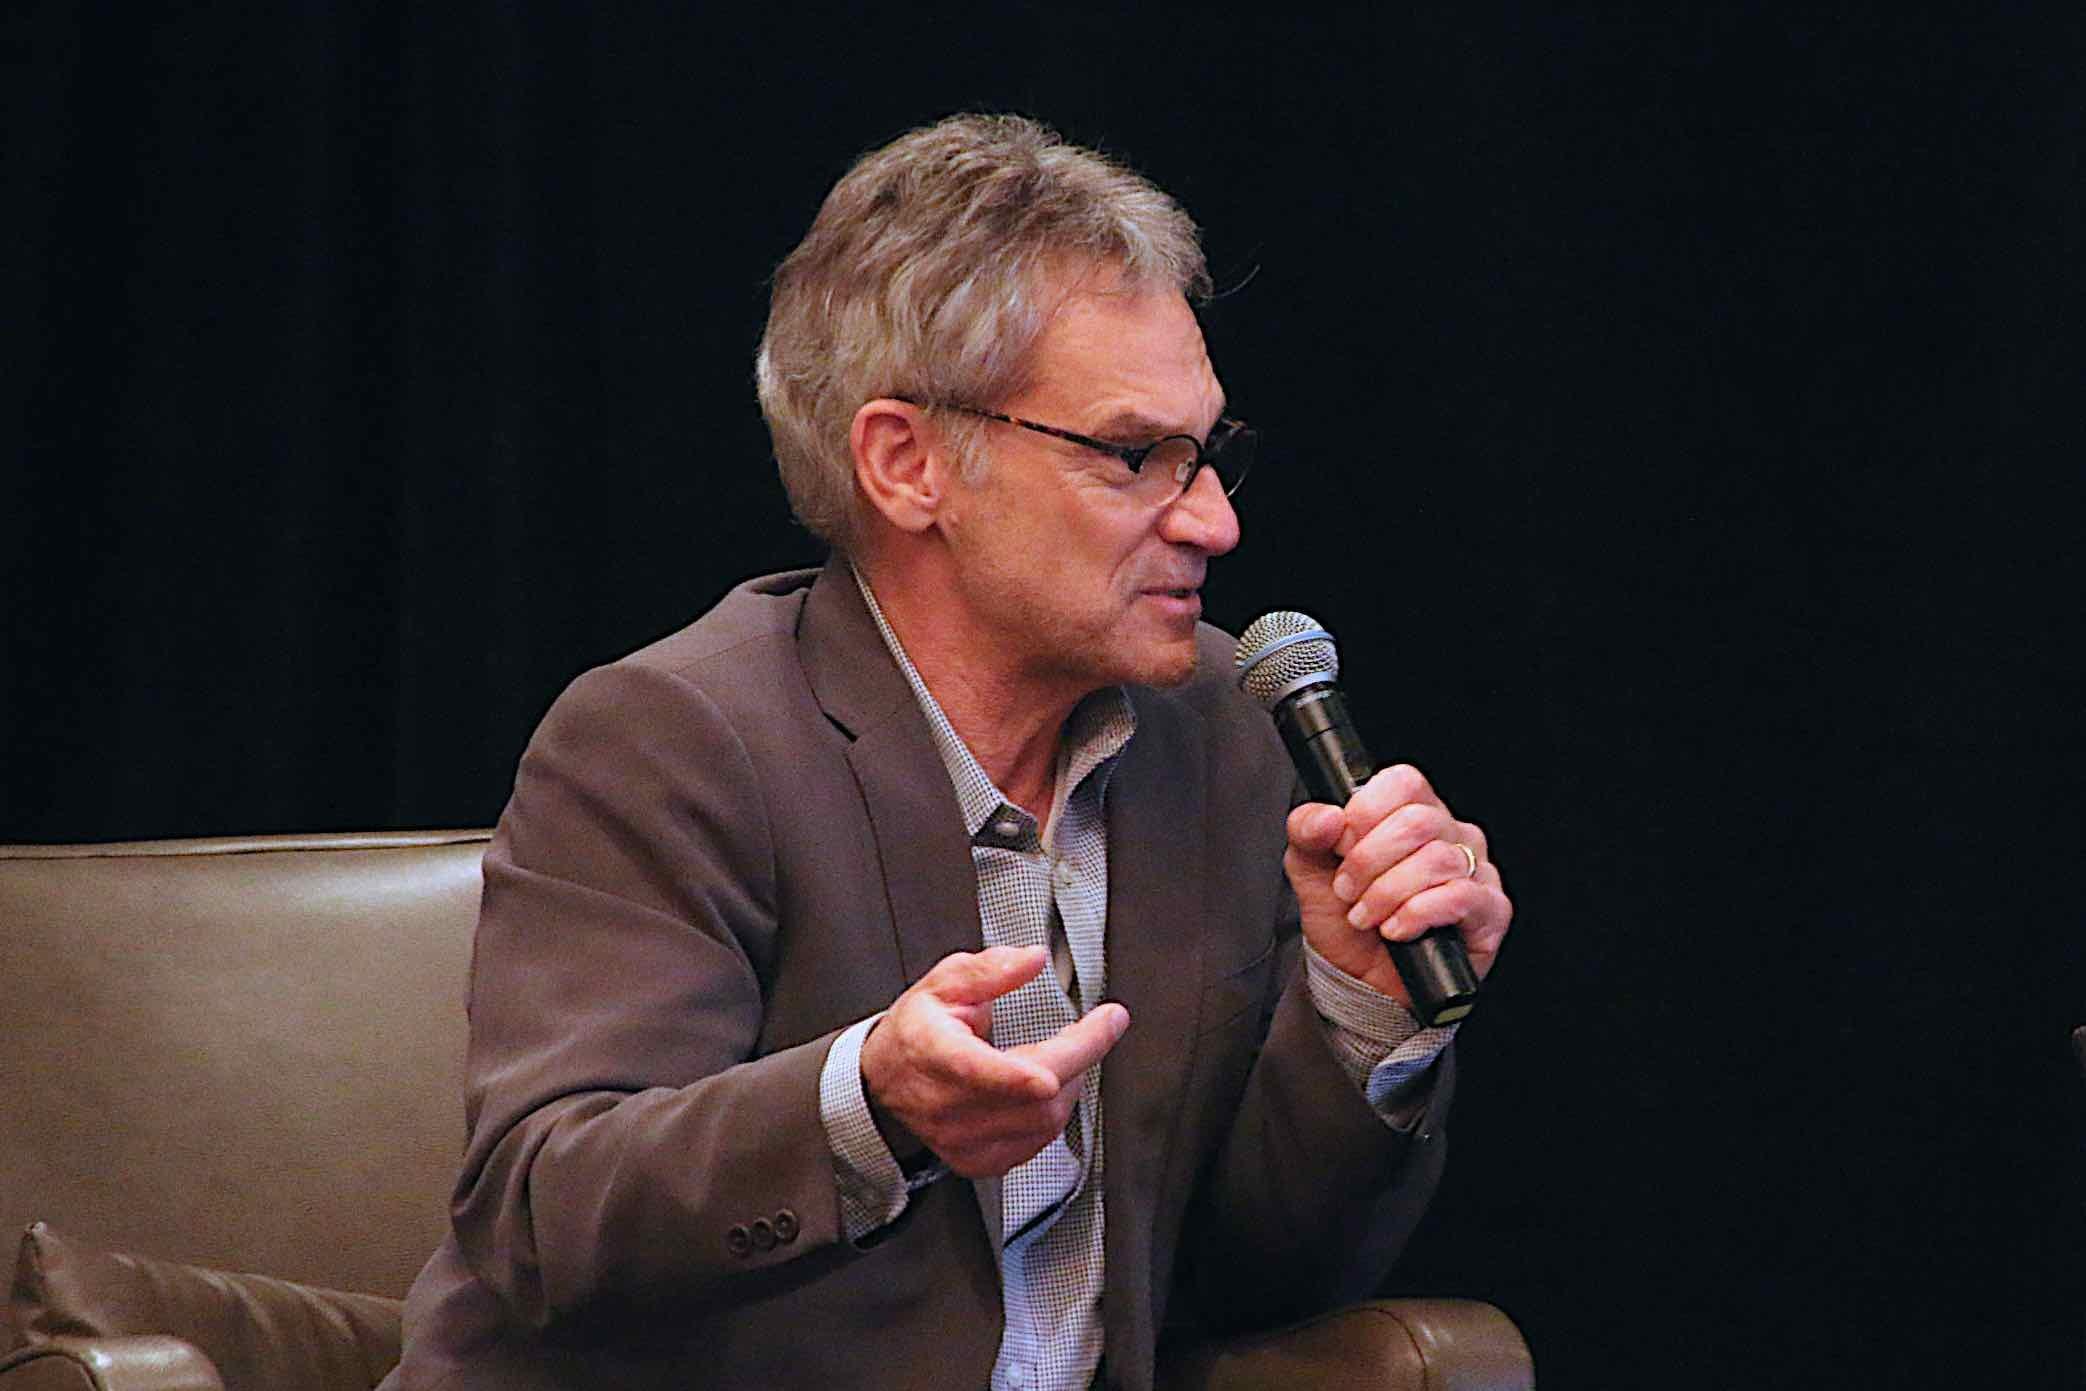 Jon Krakauer spoke in Missoula about his new book (MTN News photo)